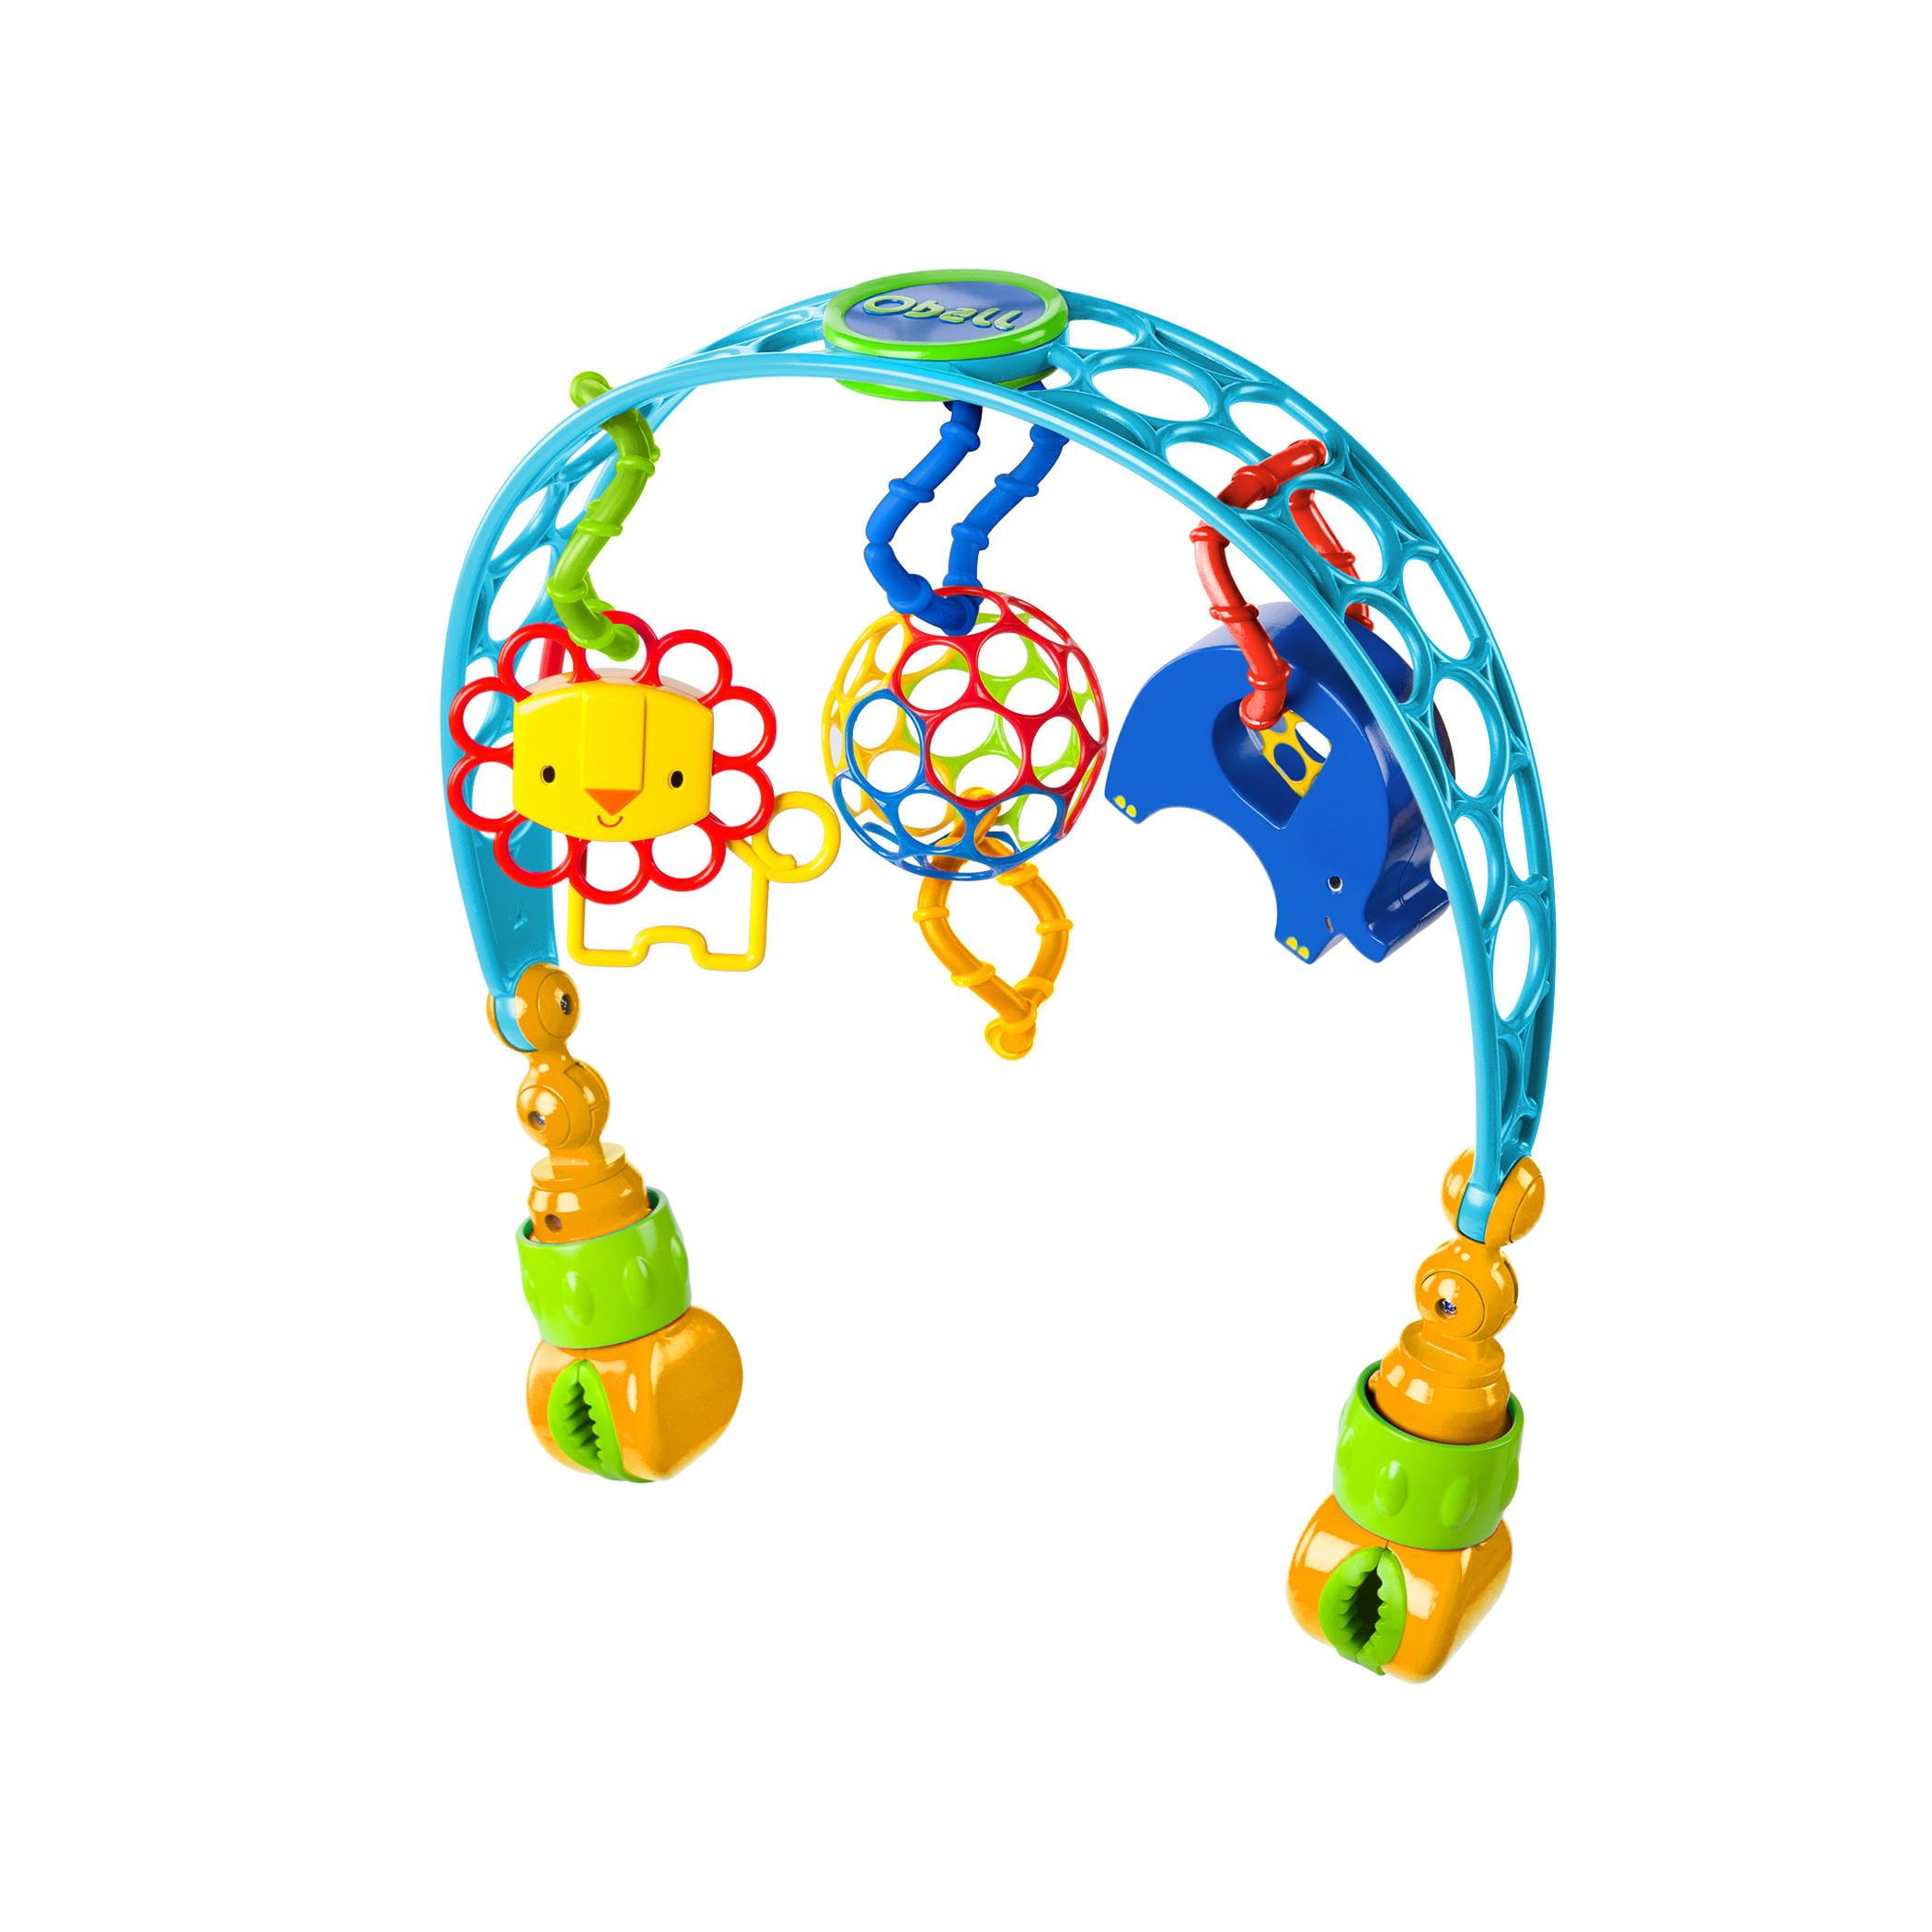 Oball Flex ���N Go Activity Arch Take Along Toy